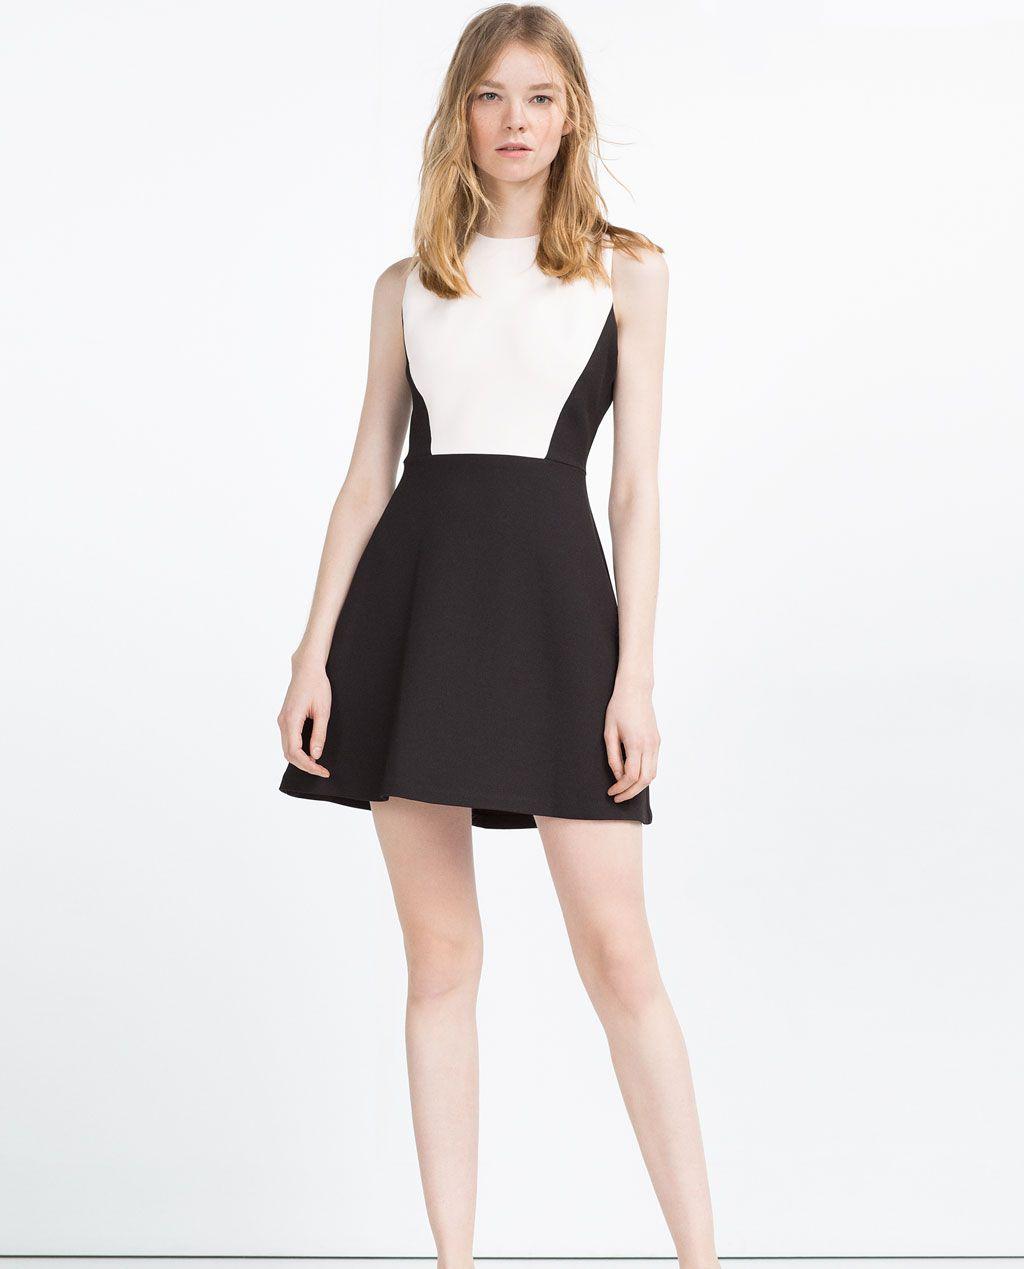 Flannel formal dress  Zaravestidocortobicolorg   vestidos  Pinterest